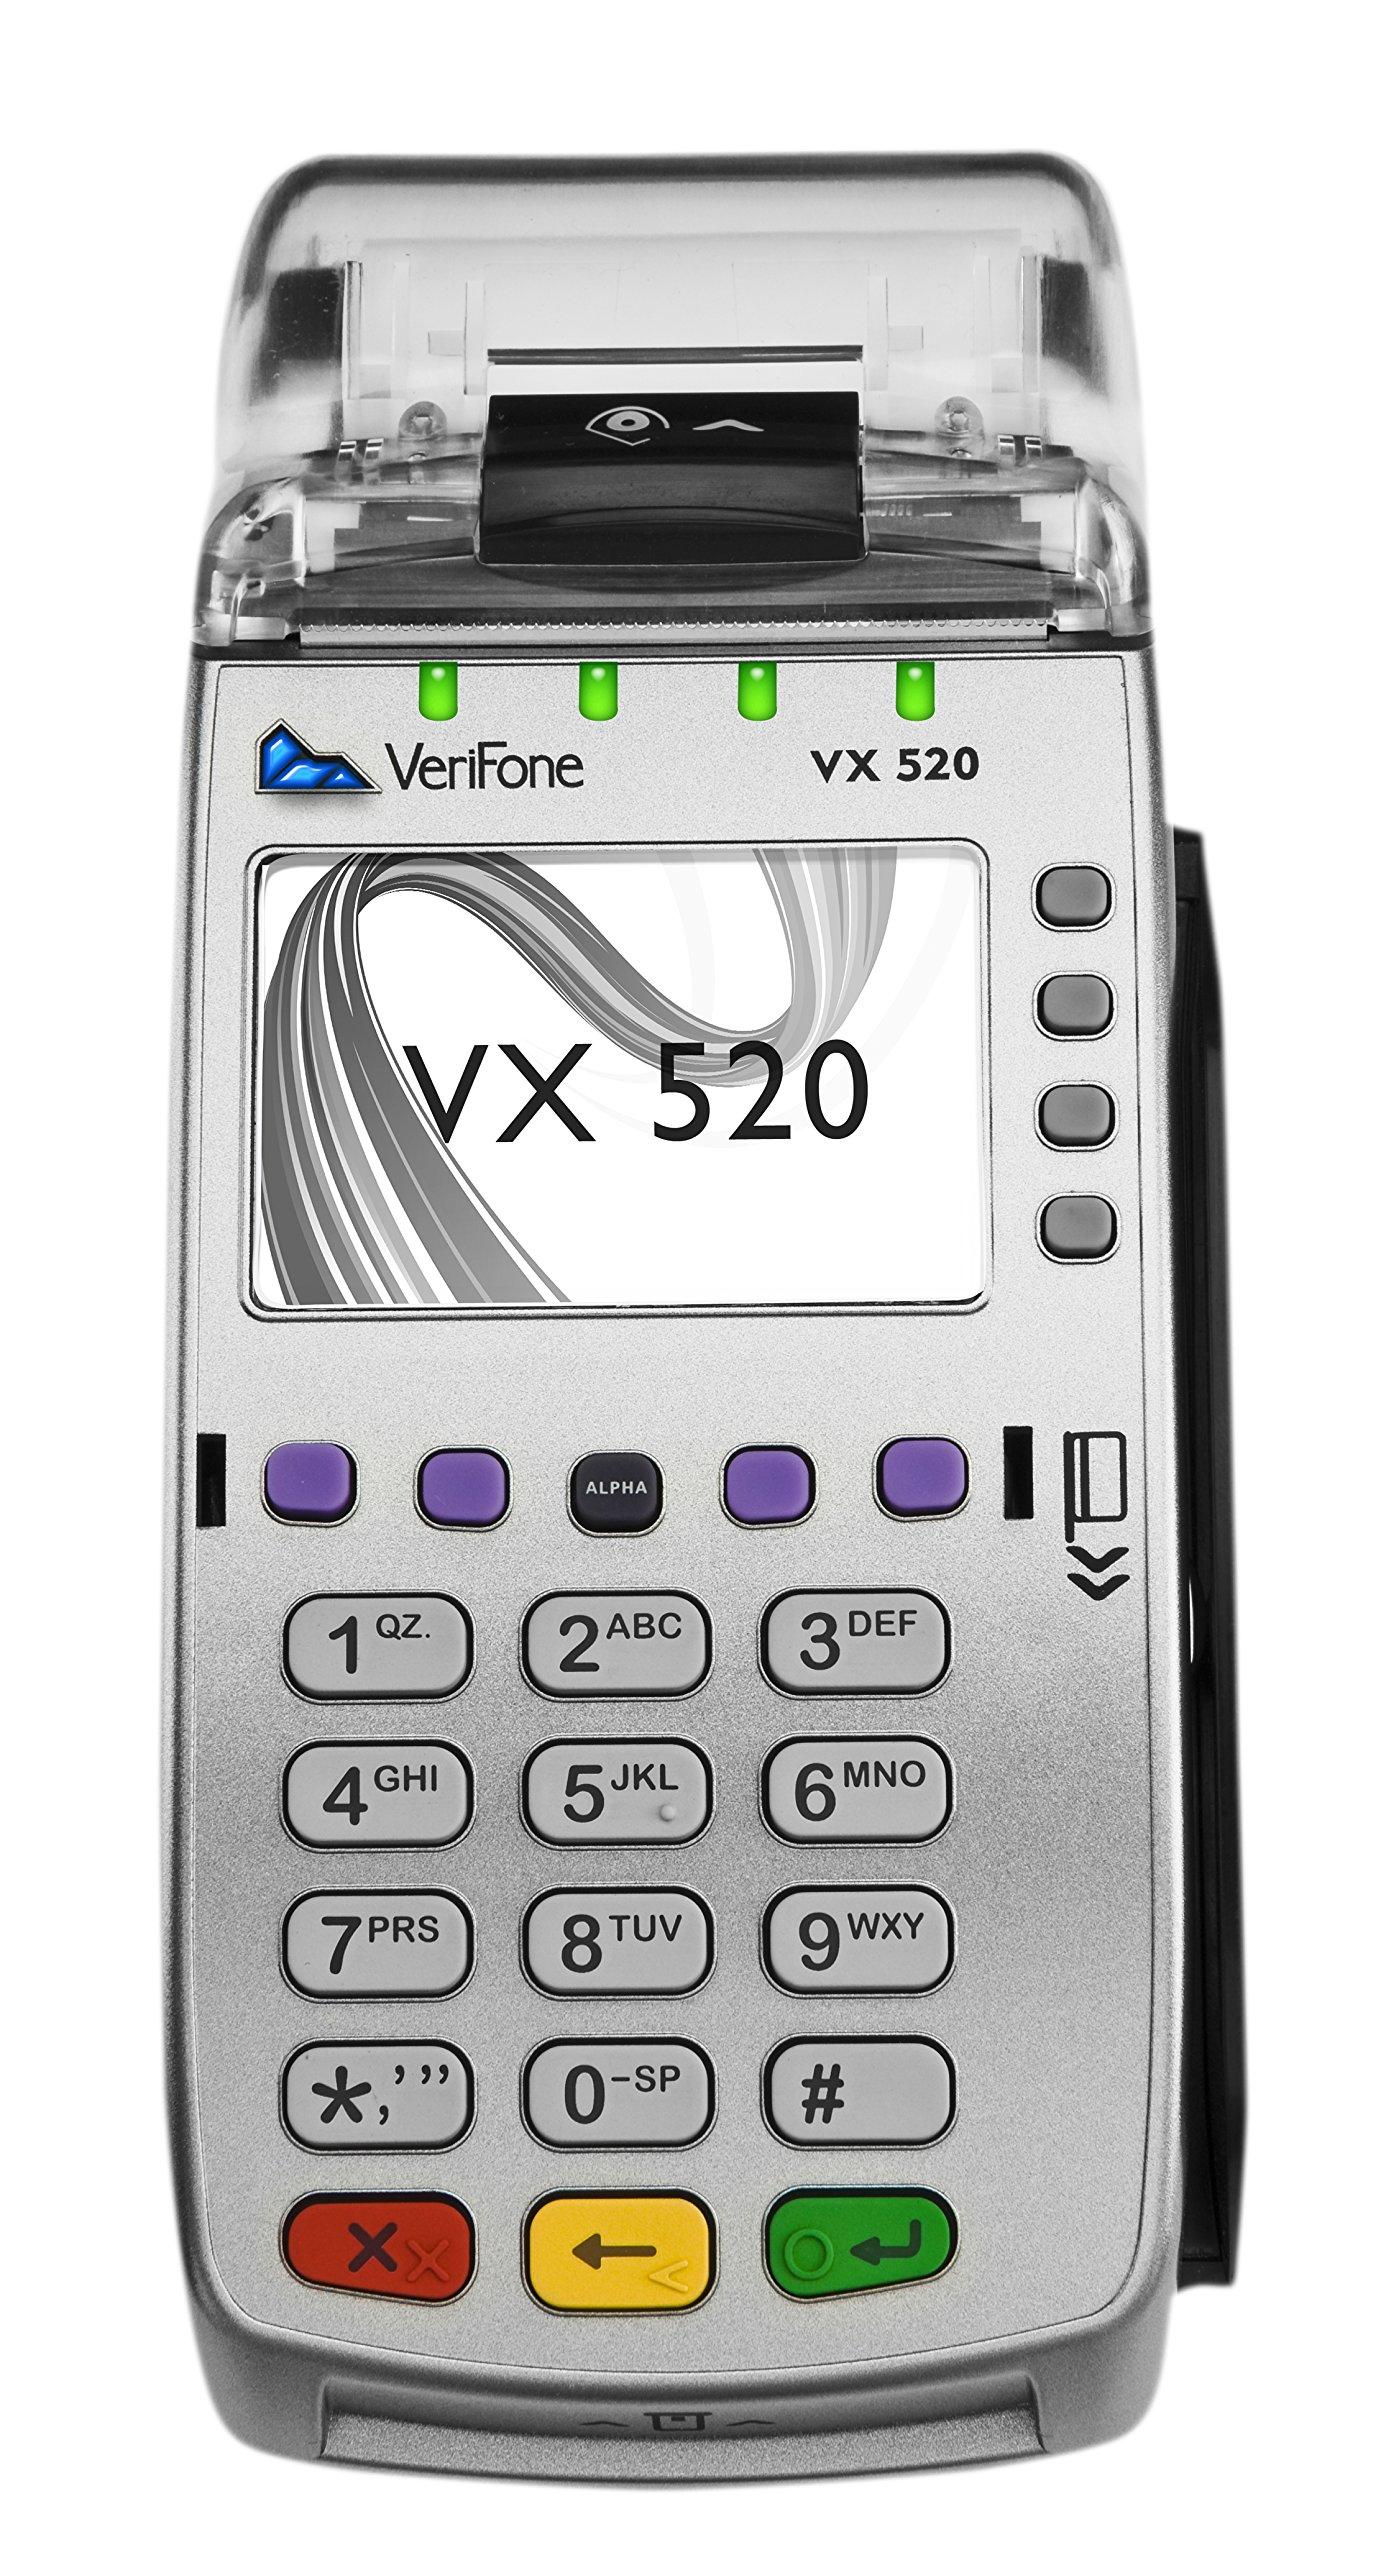 VeriFone Refurbished Vx520 EMV CLTS 64MB Credit Card Terminal by VeriFone